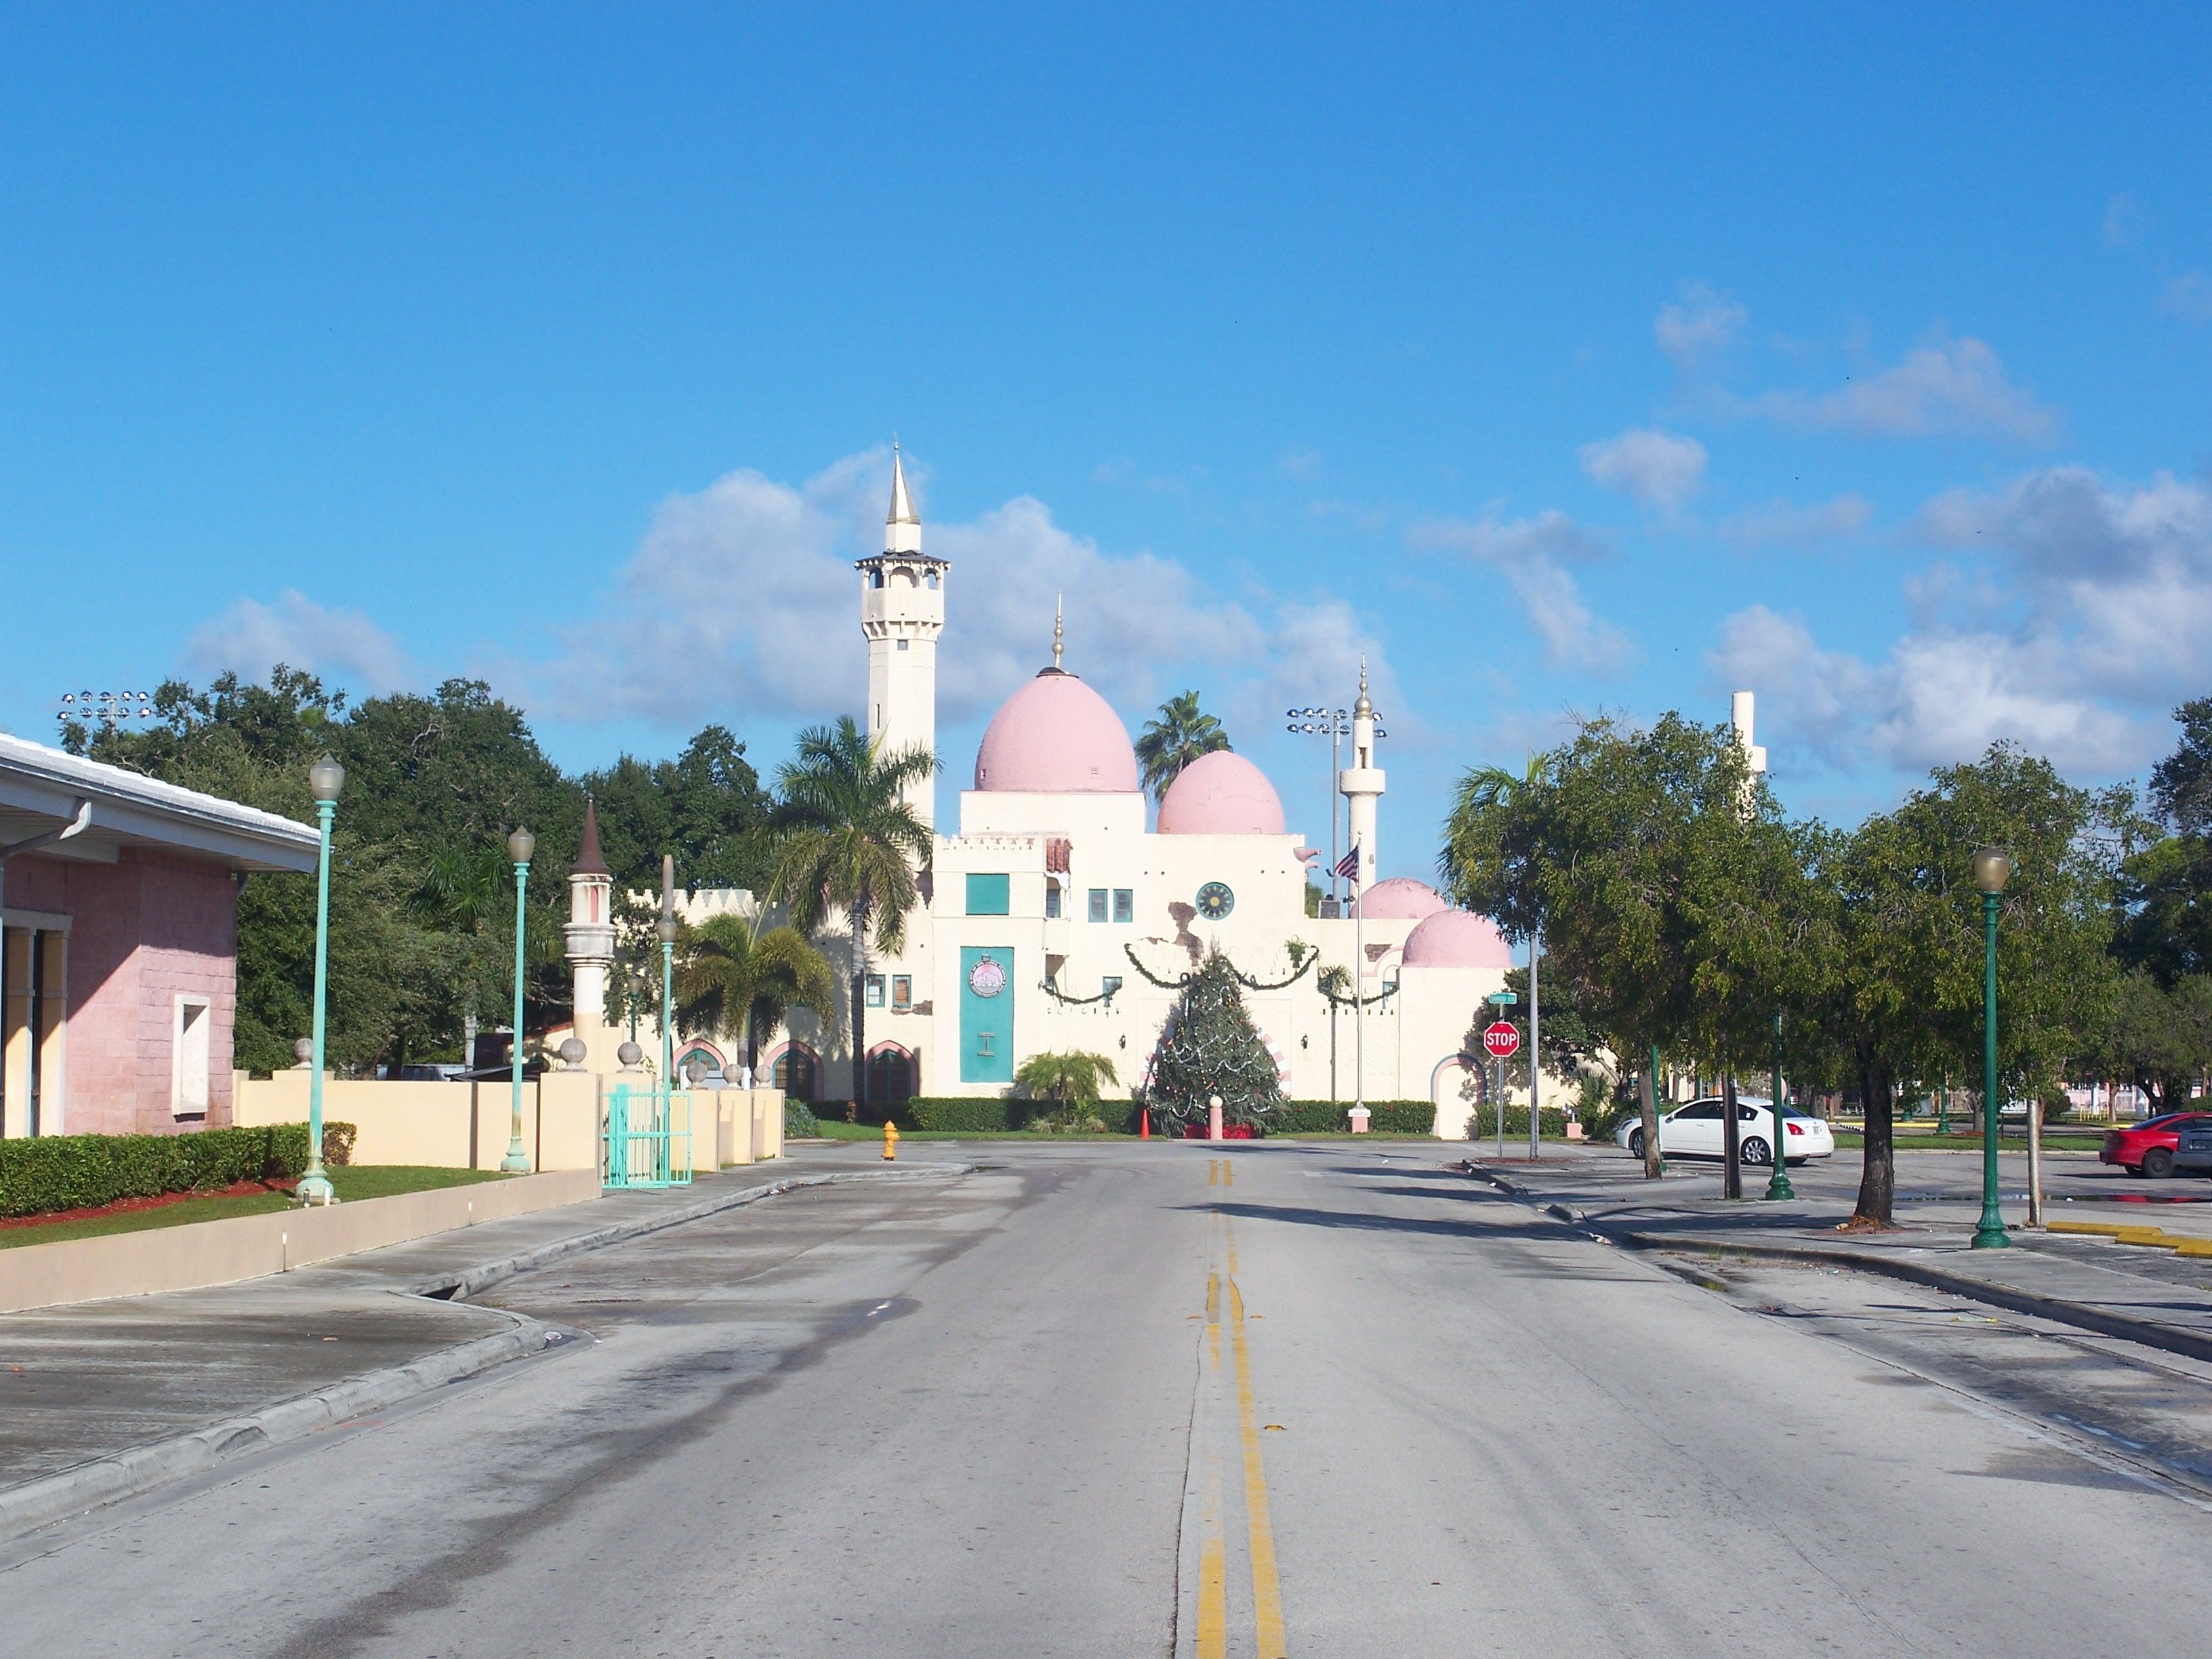 Opa Locka City Hall File:opa Locka fl City Hall07